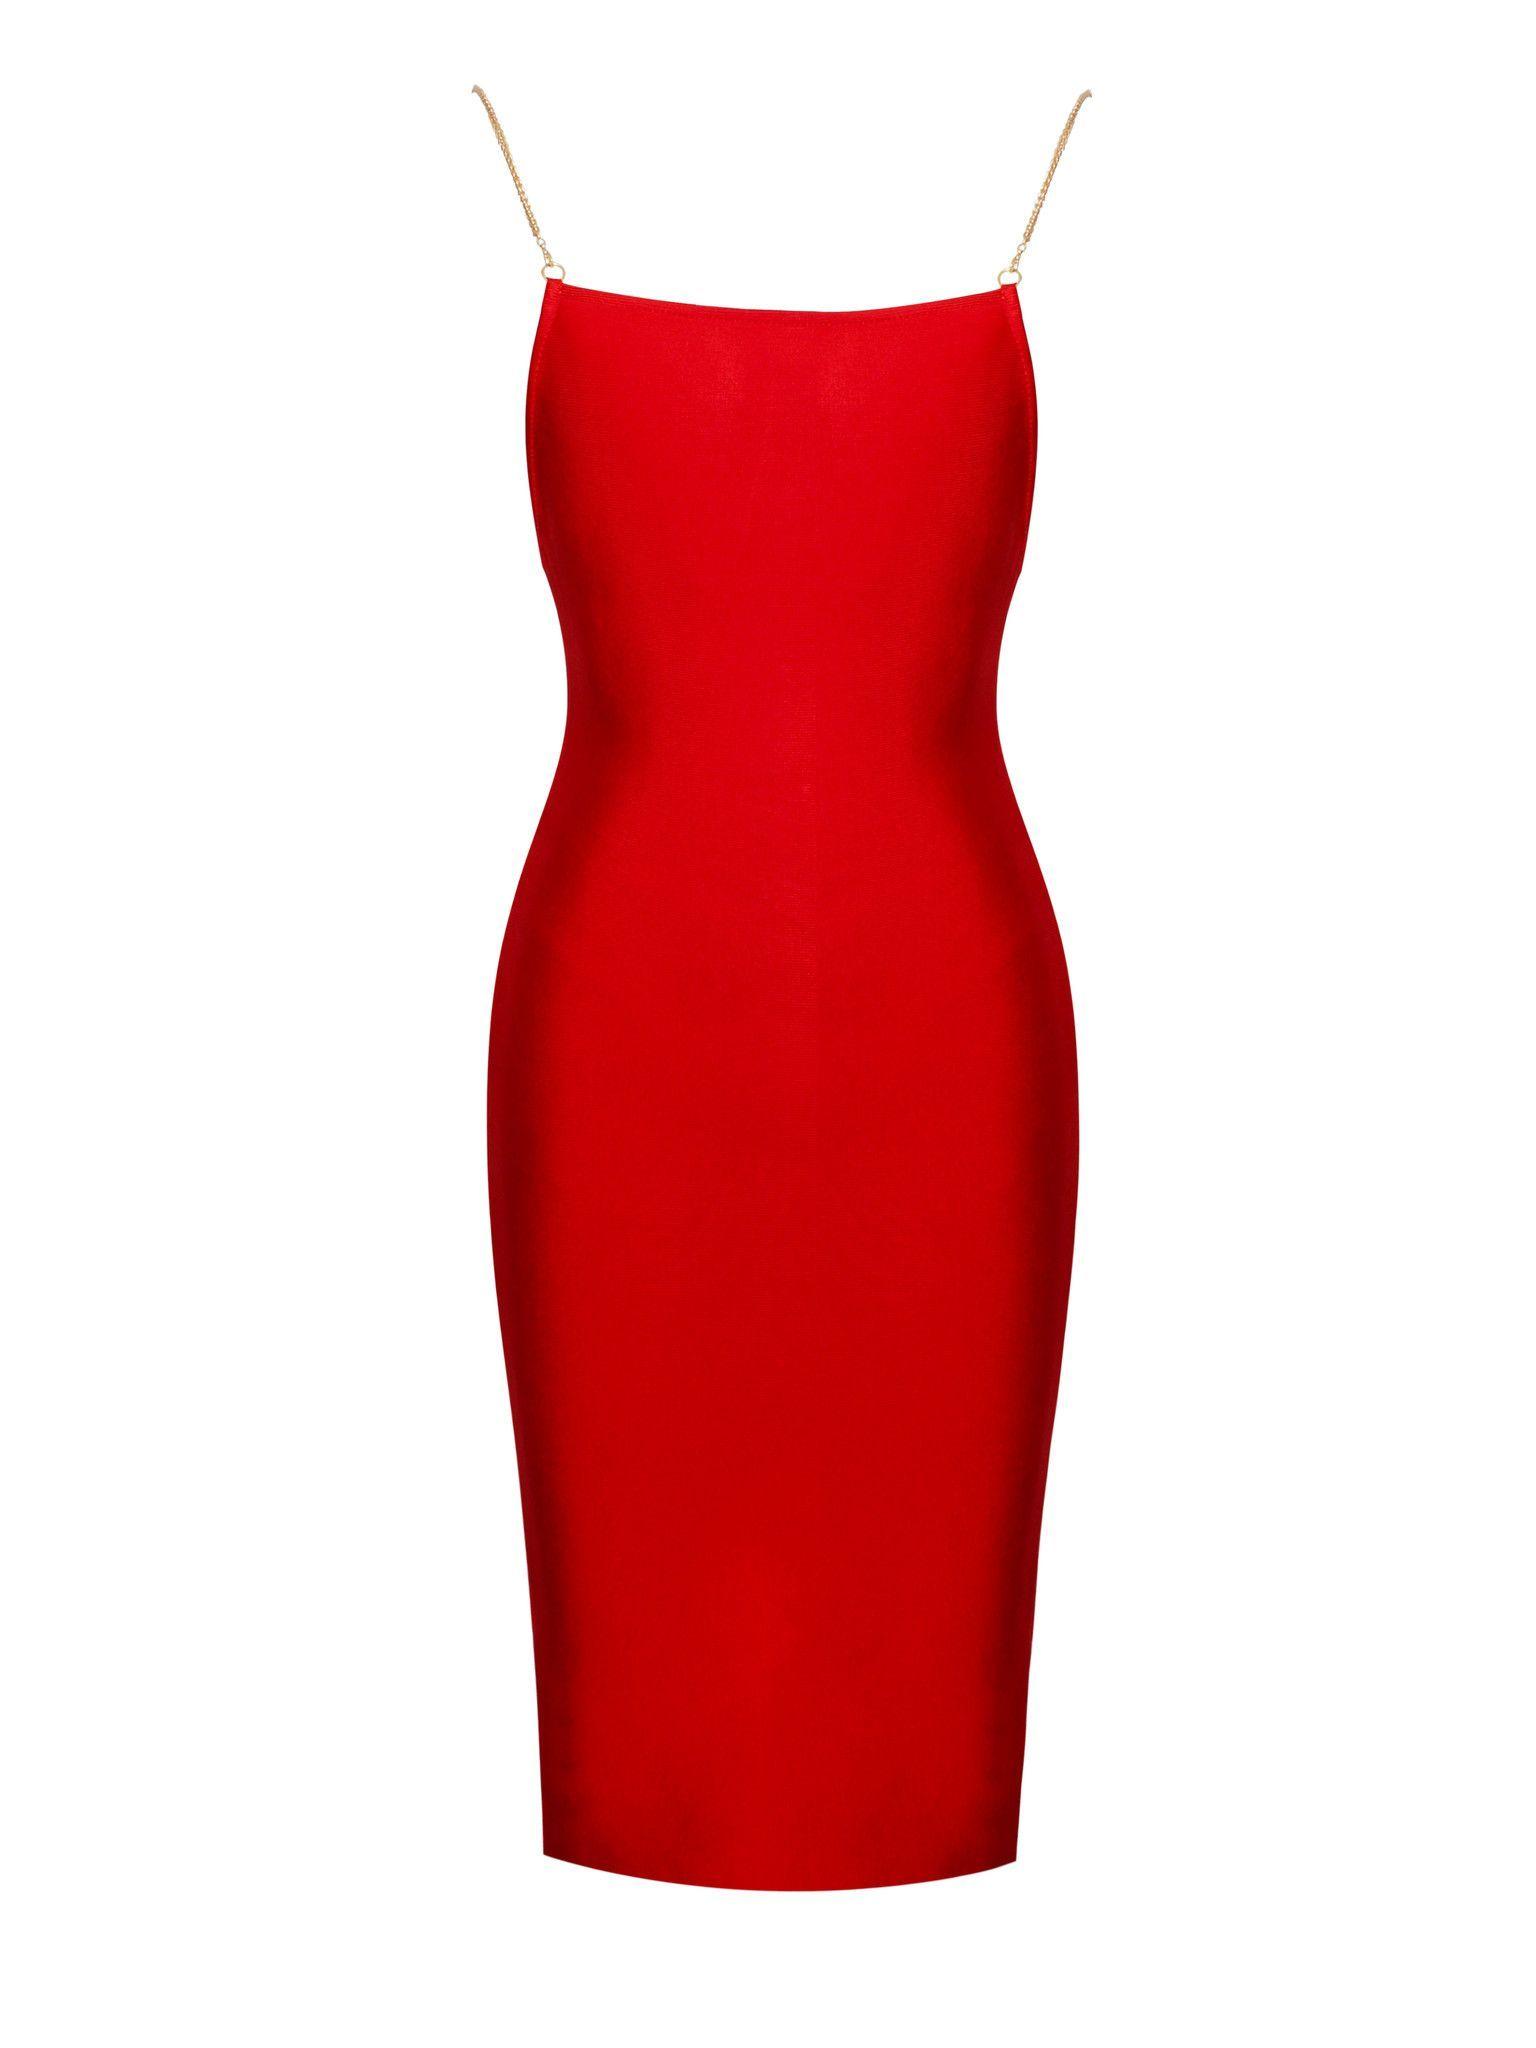 9615ba45b7cf Yolanda Glold Chain Strap Red Bandage Dress | Products | Red bandage ...